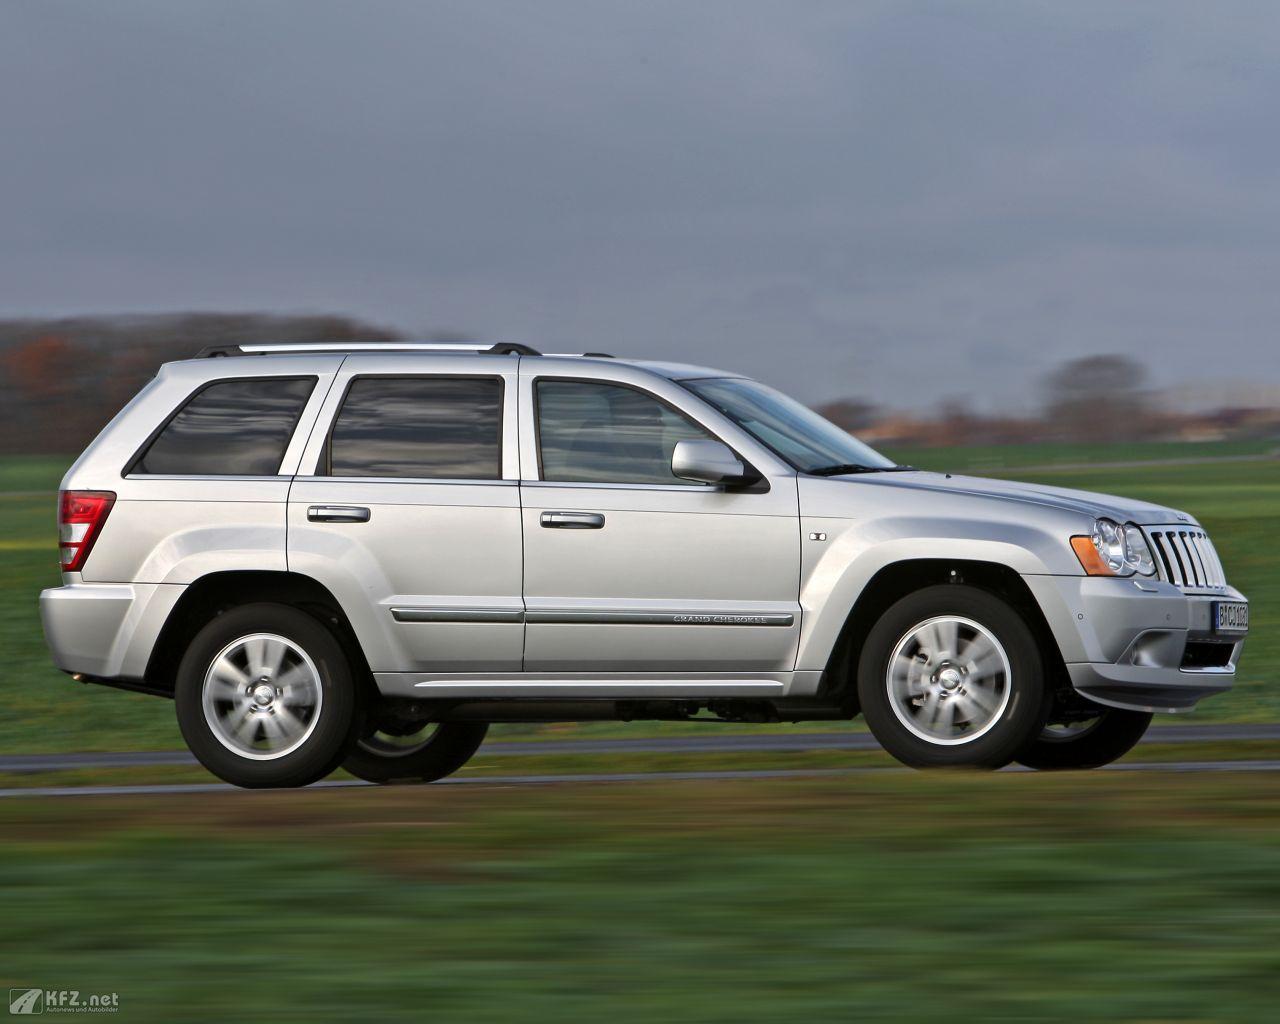 jeep-grand-cherokee-1280x1024-19